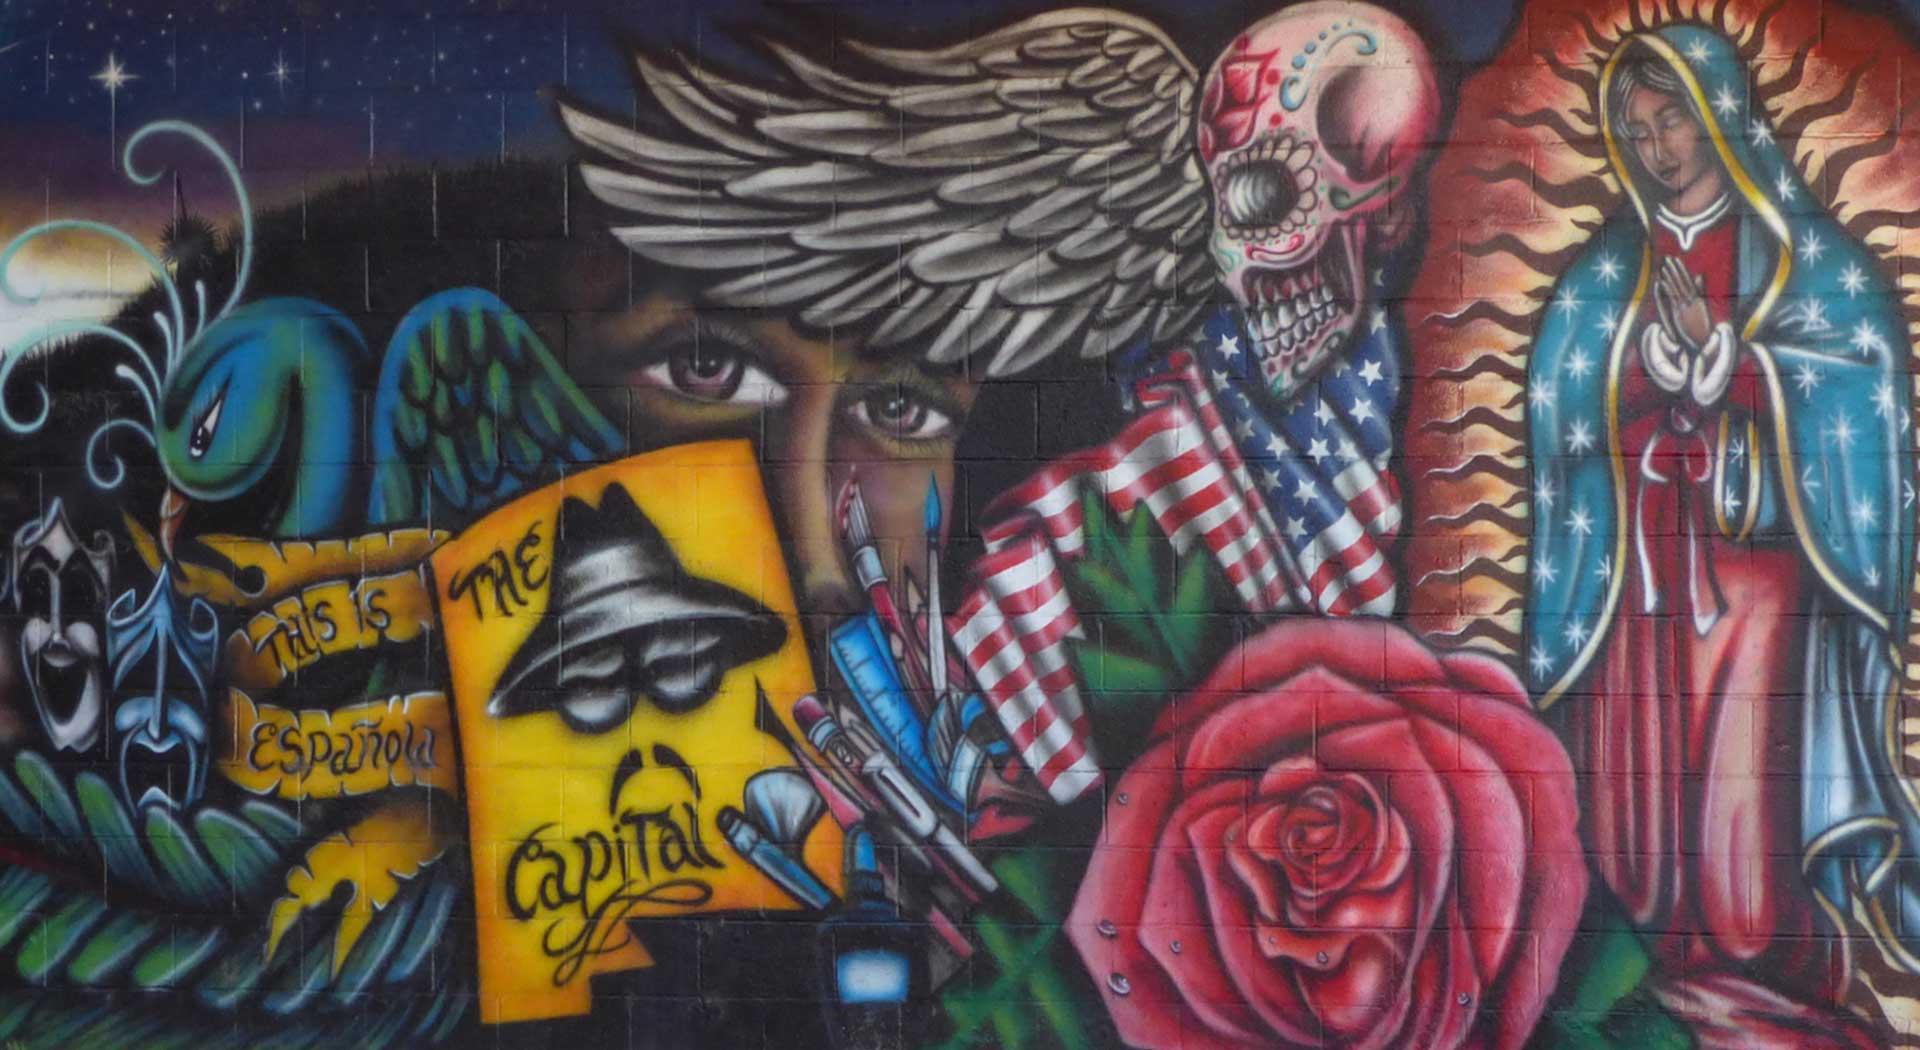 espanola-mural